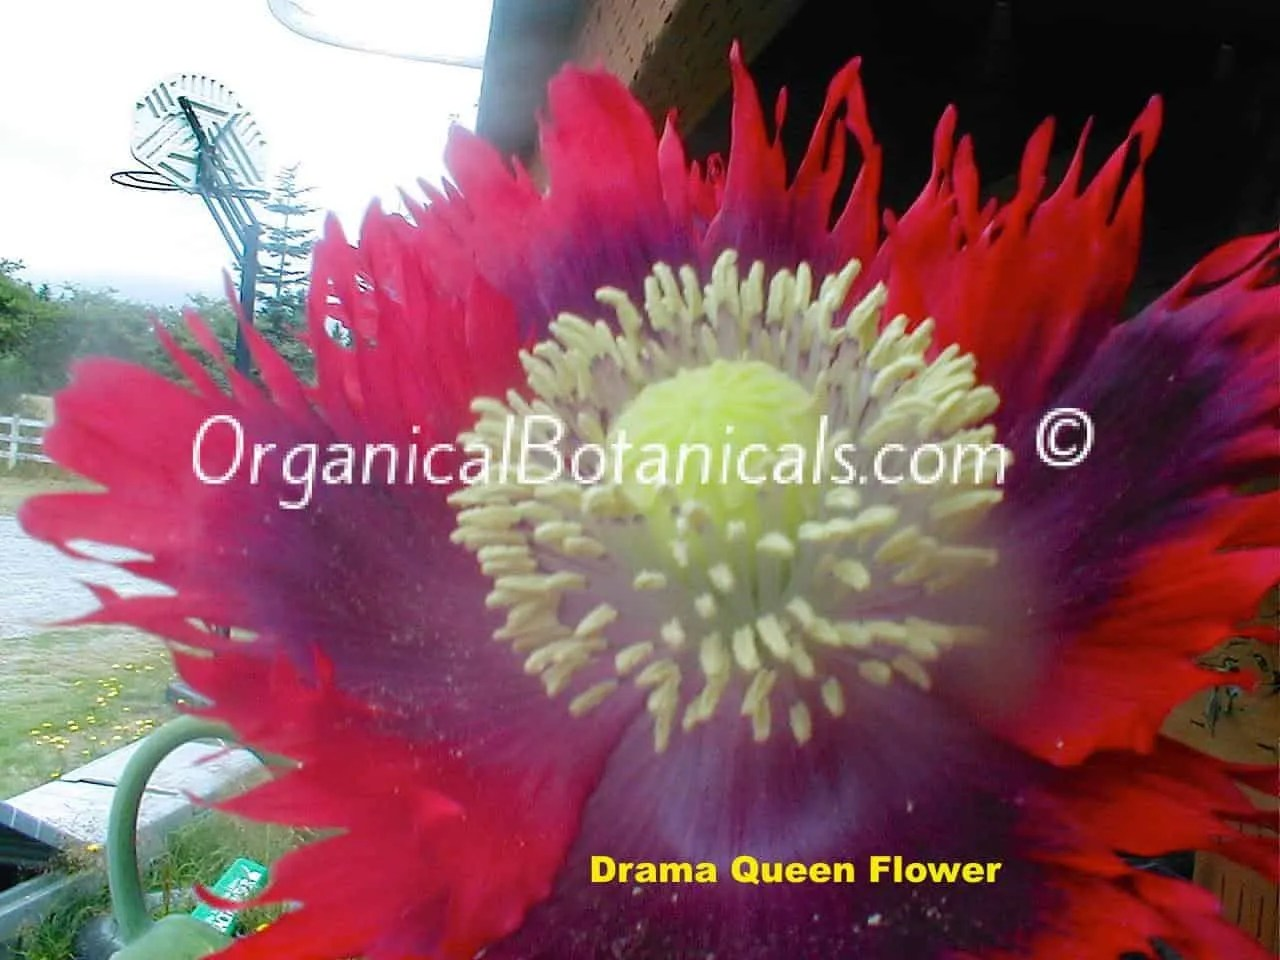 Somniferum exotic mix top shelf quality poppy seeds organical drama queen papaver somniferum poppy flower mightylinksfo